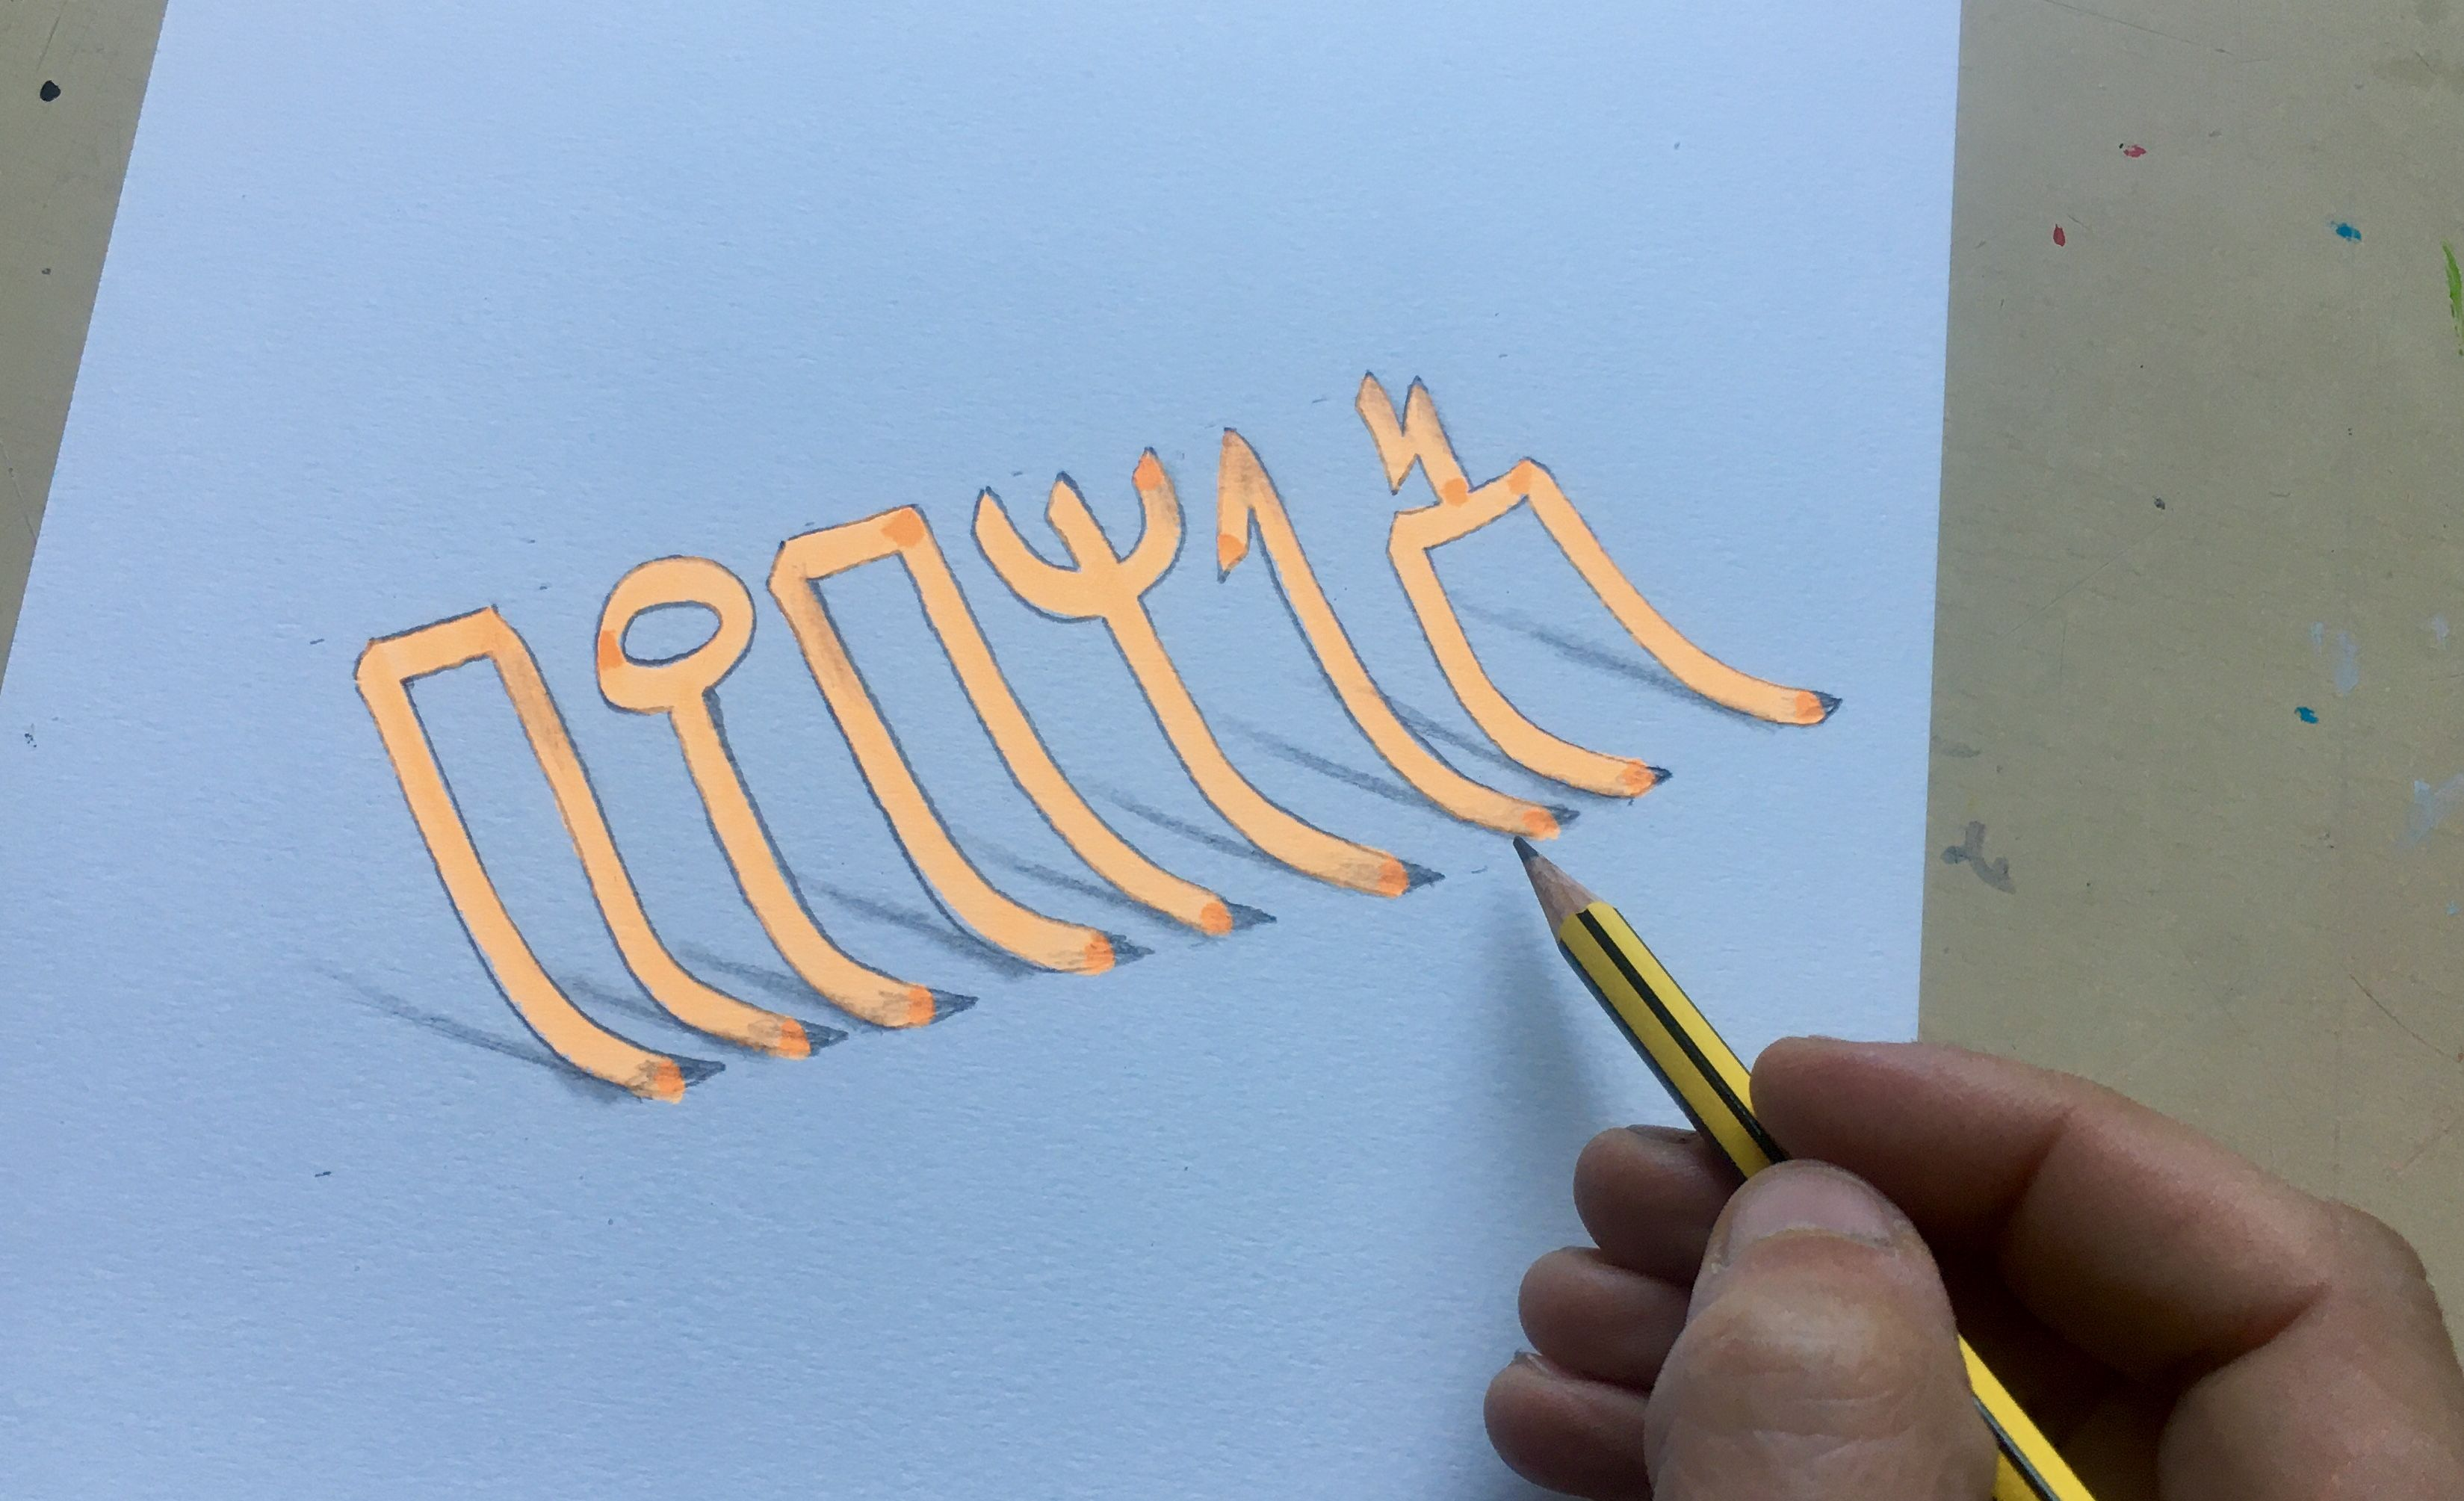 3d Arabic Calligraphy Drawing By Sami Gharbi Calligraphy Drawing Drawings Calligraphy